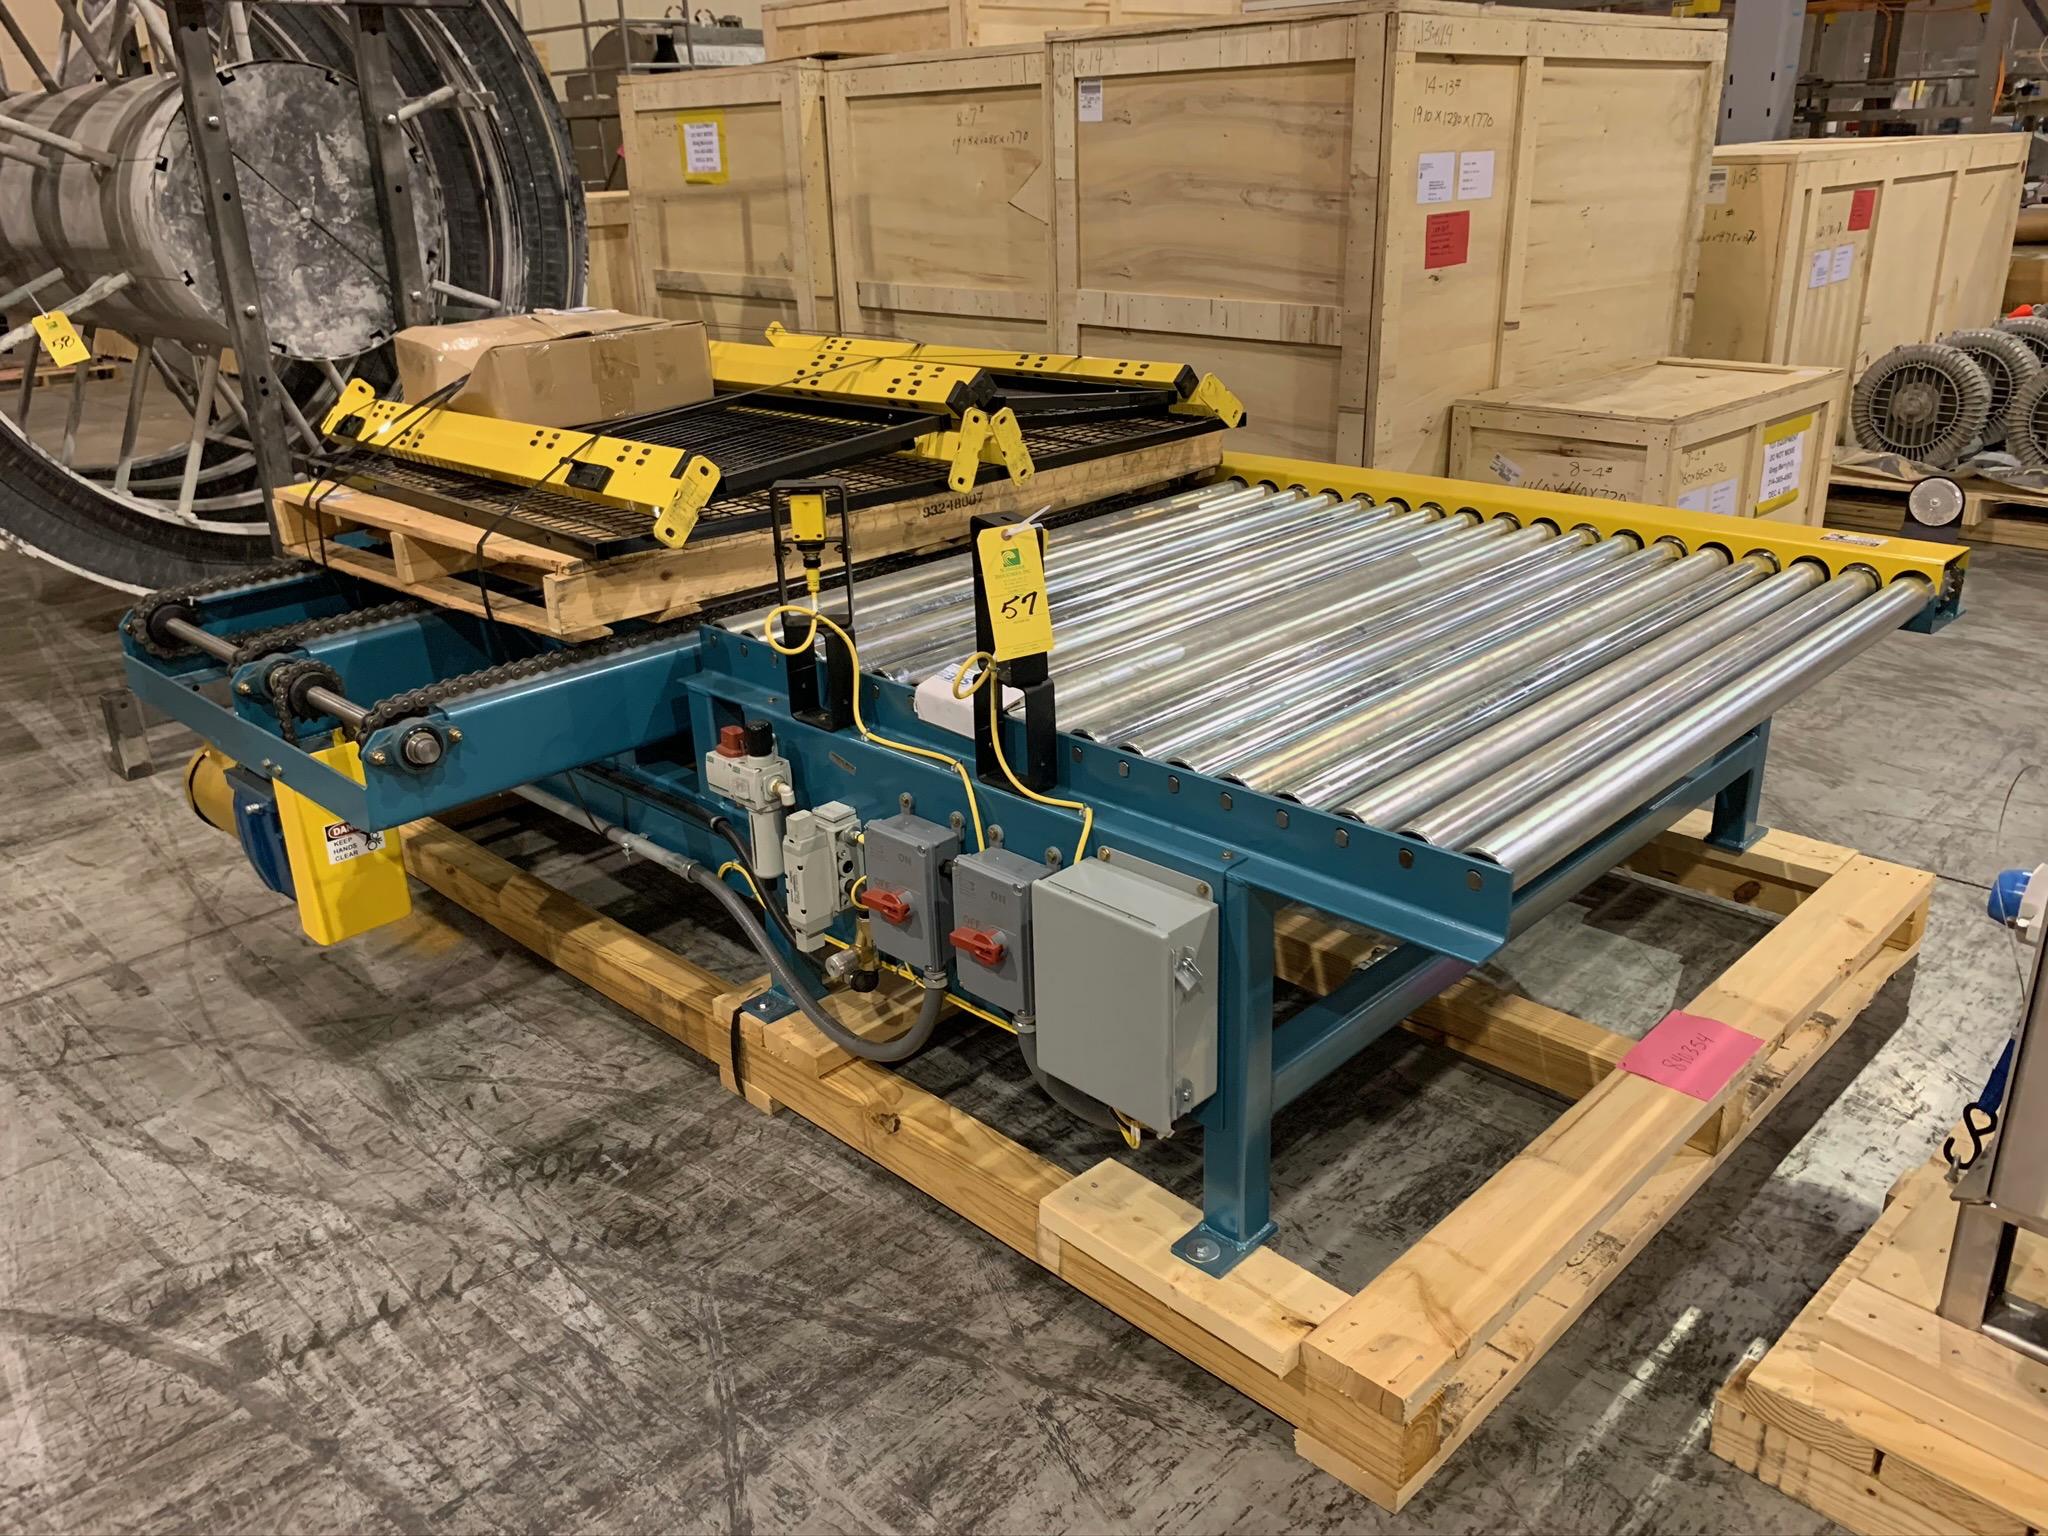 Lot 57 - Kaufman Roller Conveyor with Cross Chain (Rigging Fee - $250)